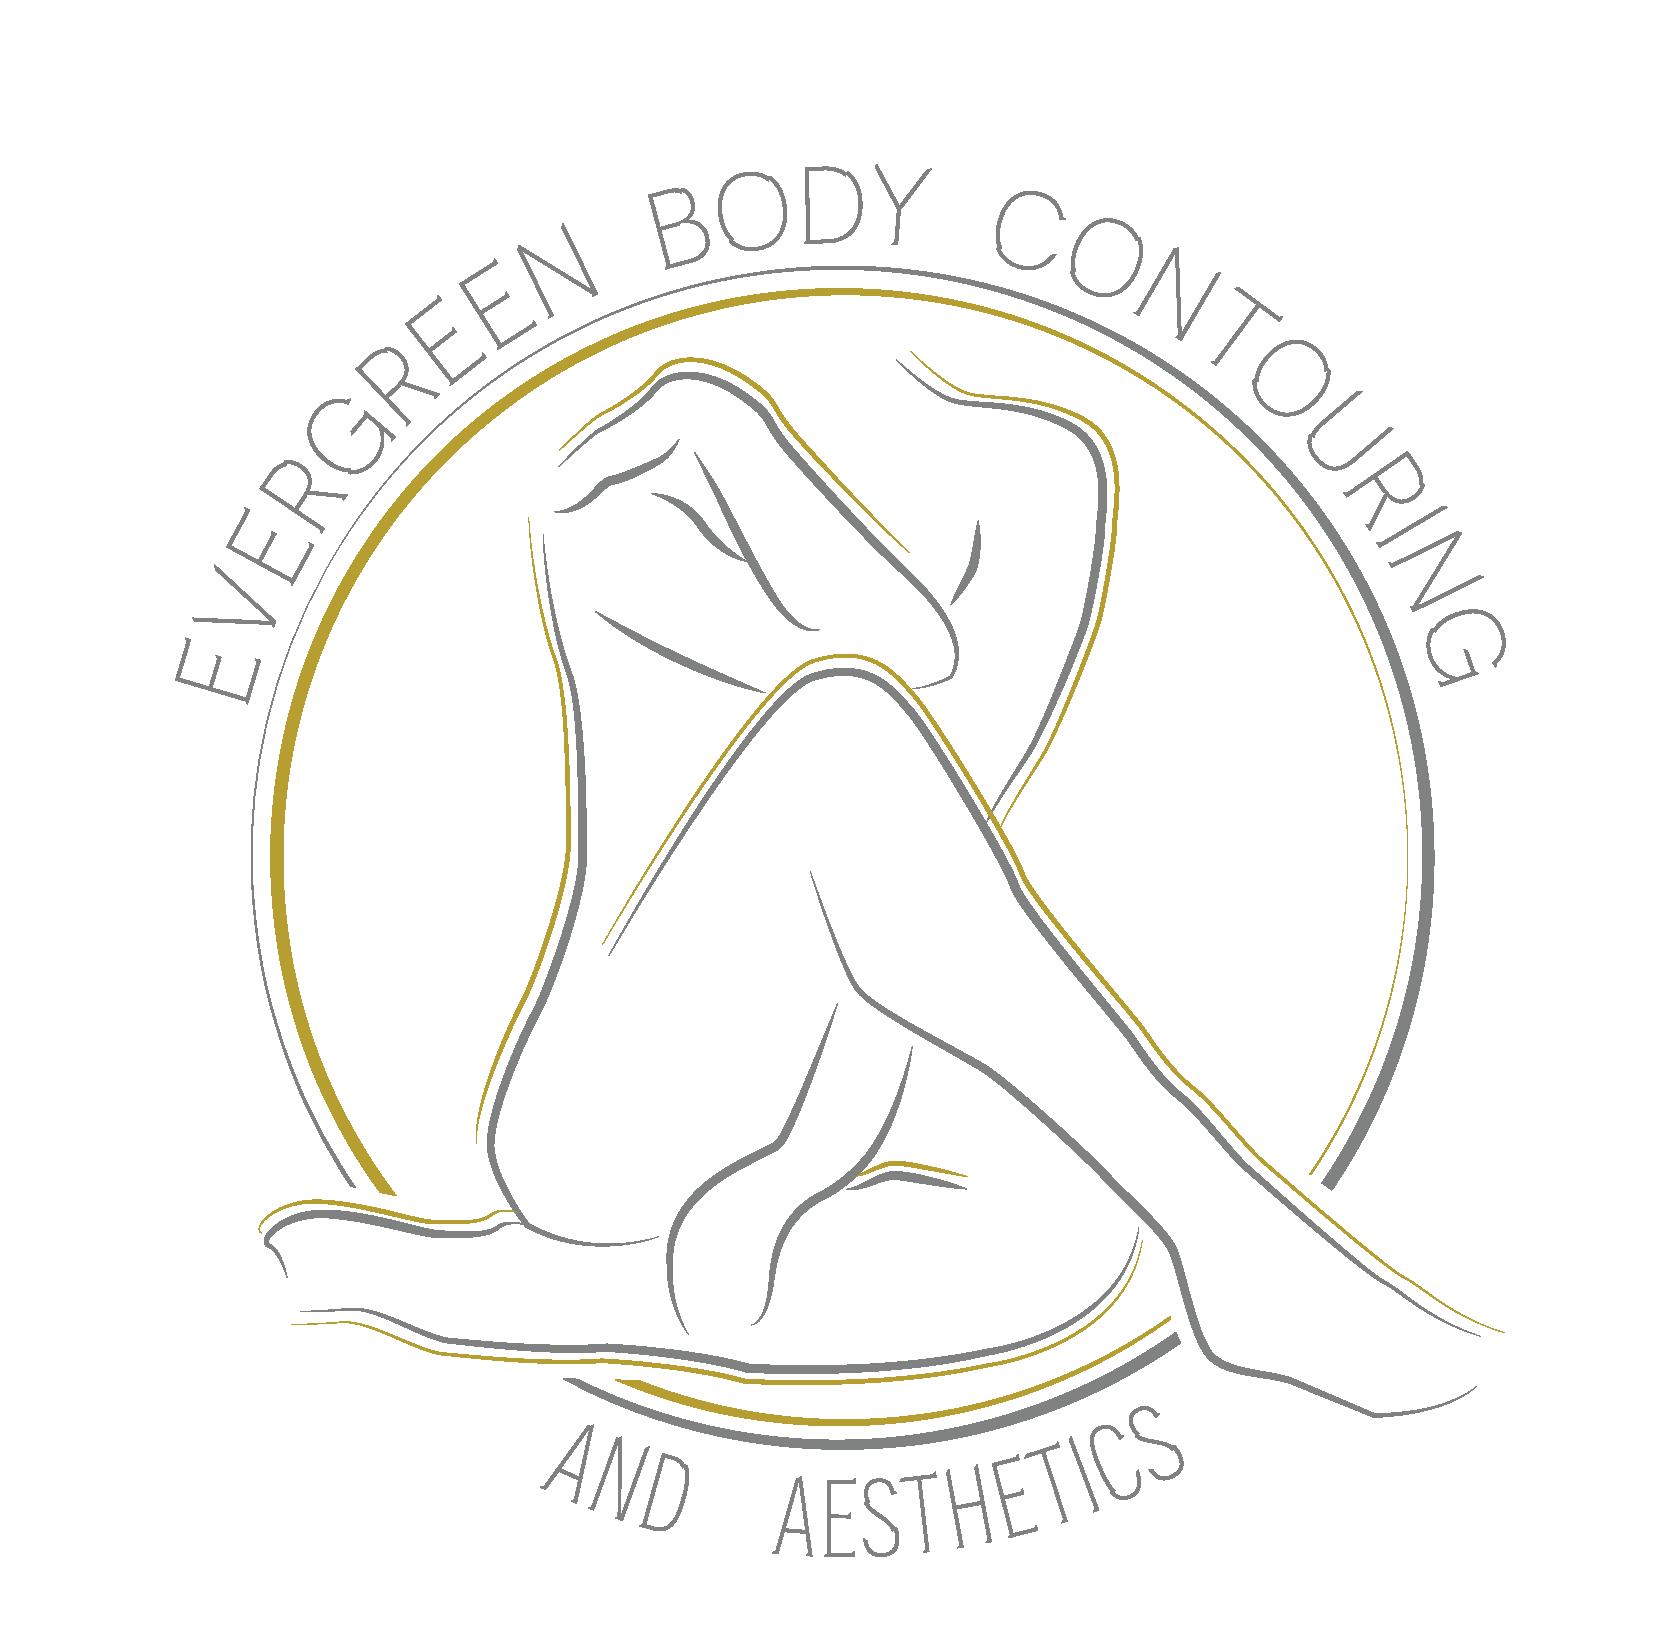 Evergreen Body Contouring and Aethetics Logo - Transparent Background